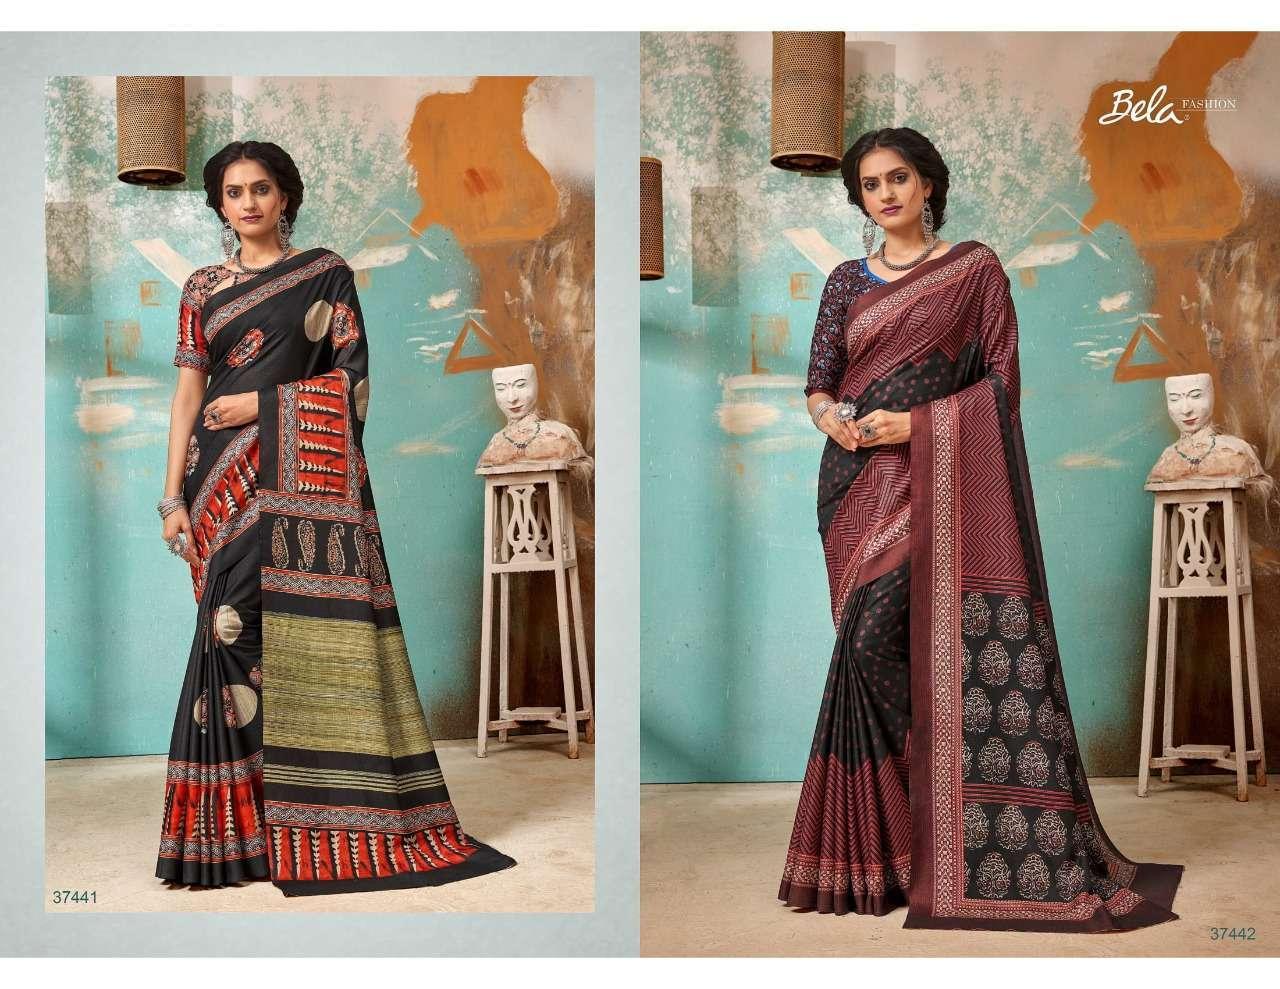 Bela Fashion Tulsi Khadi Silk With Digital Print Sarees Collection 01